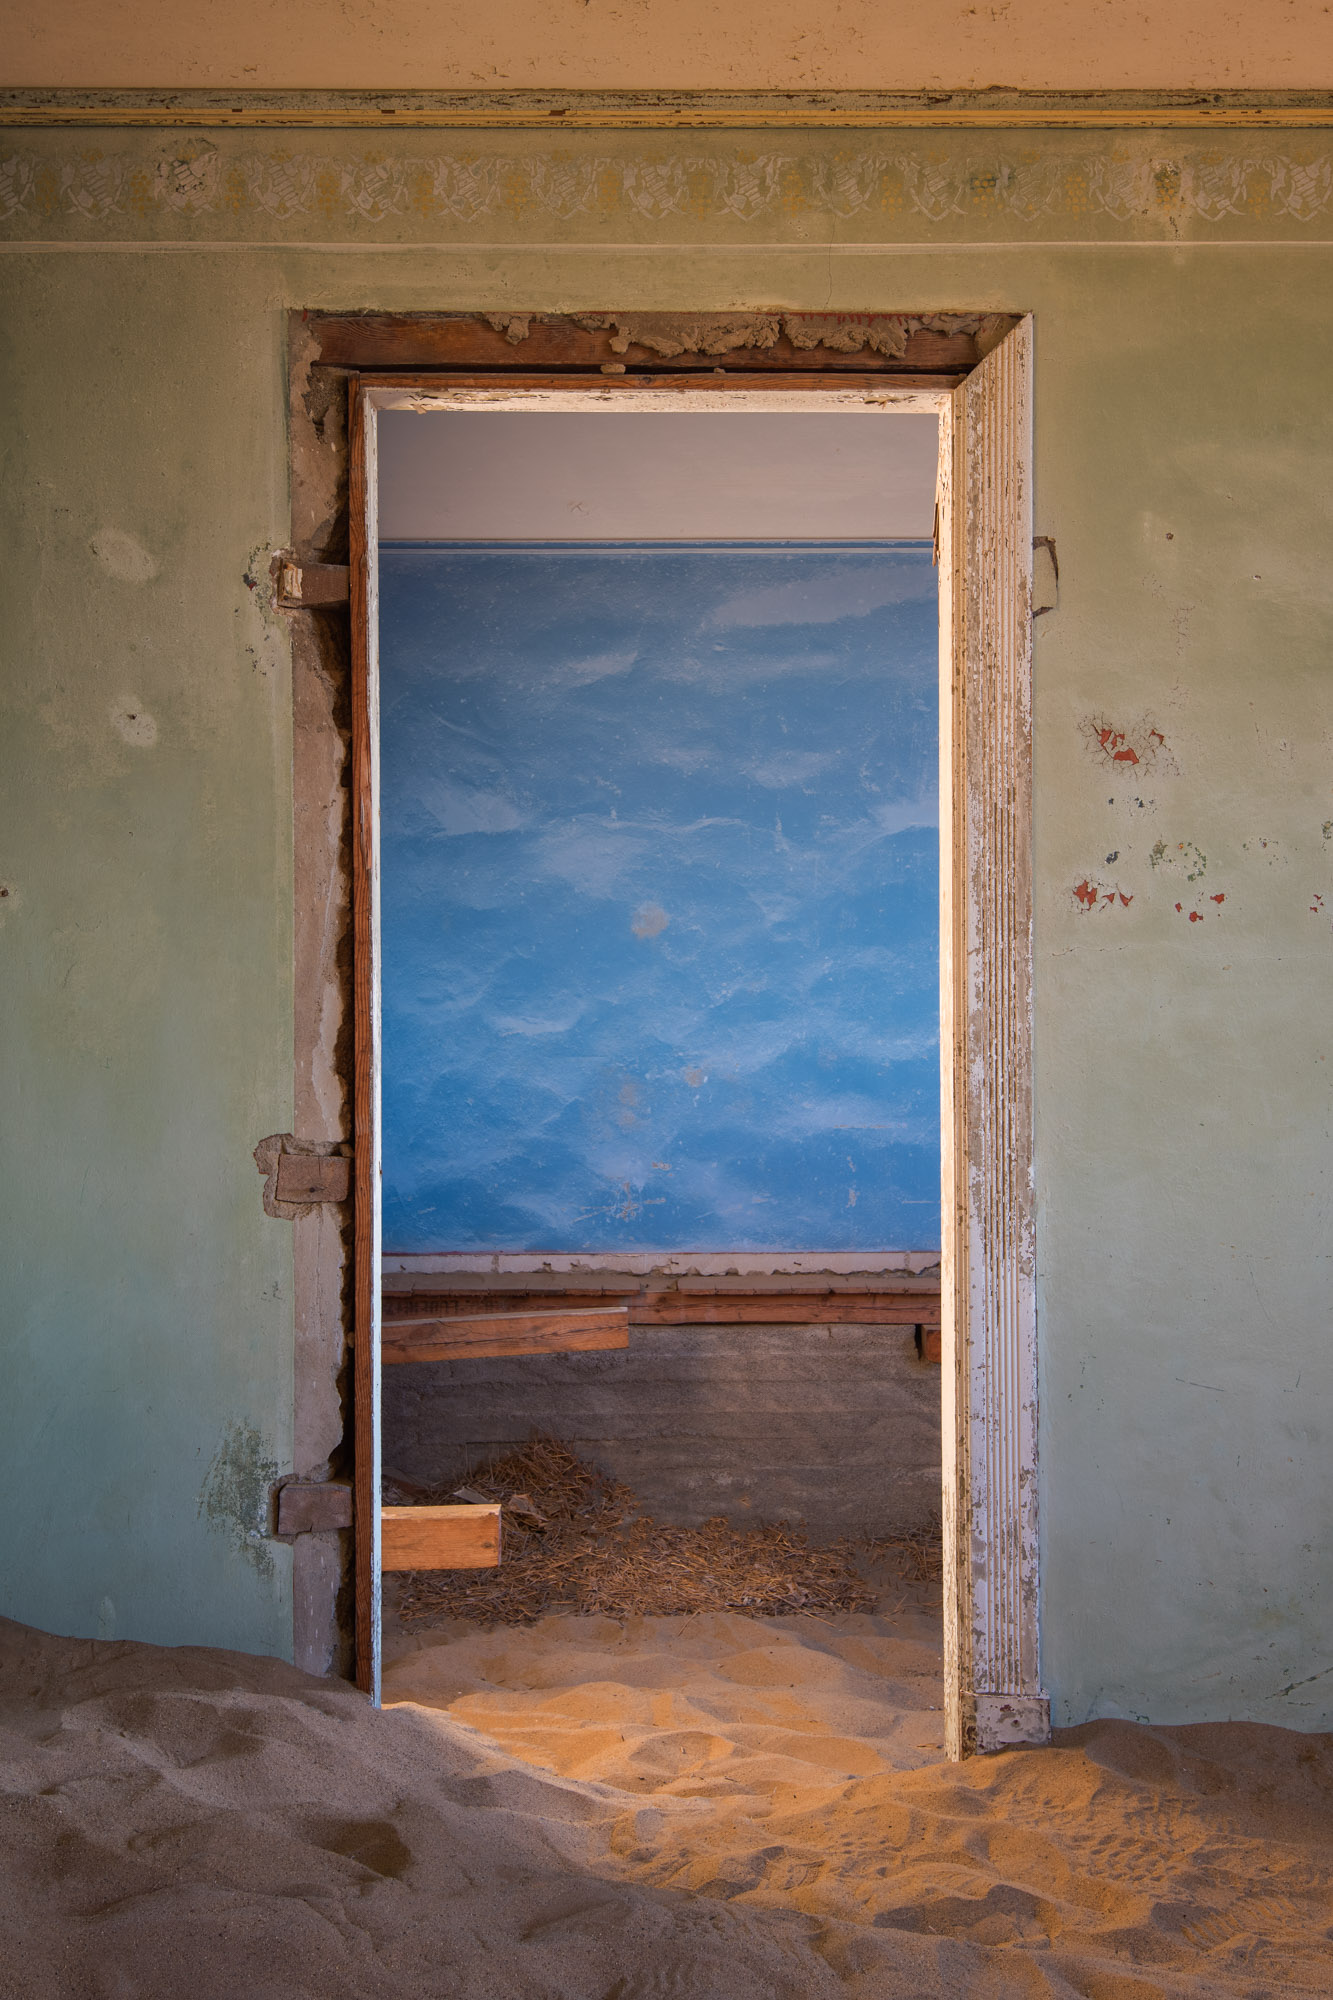 Doorway in an Abandoned House, Kolmanskop, Namibia